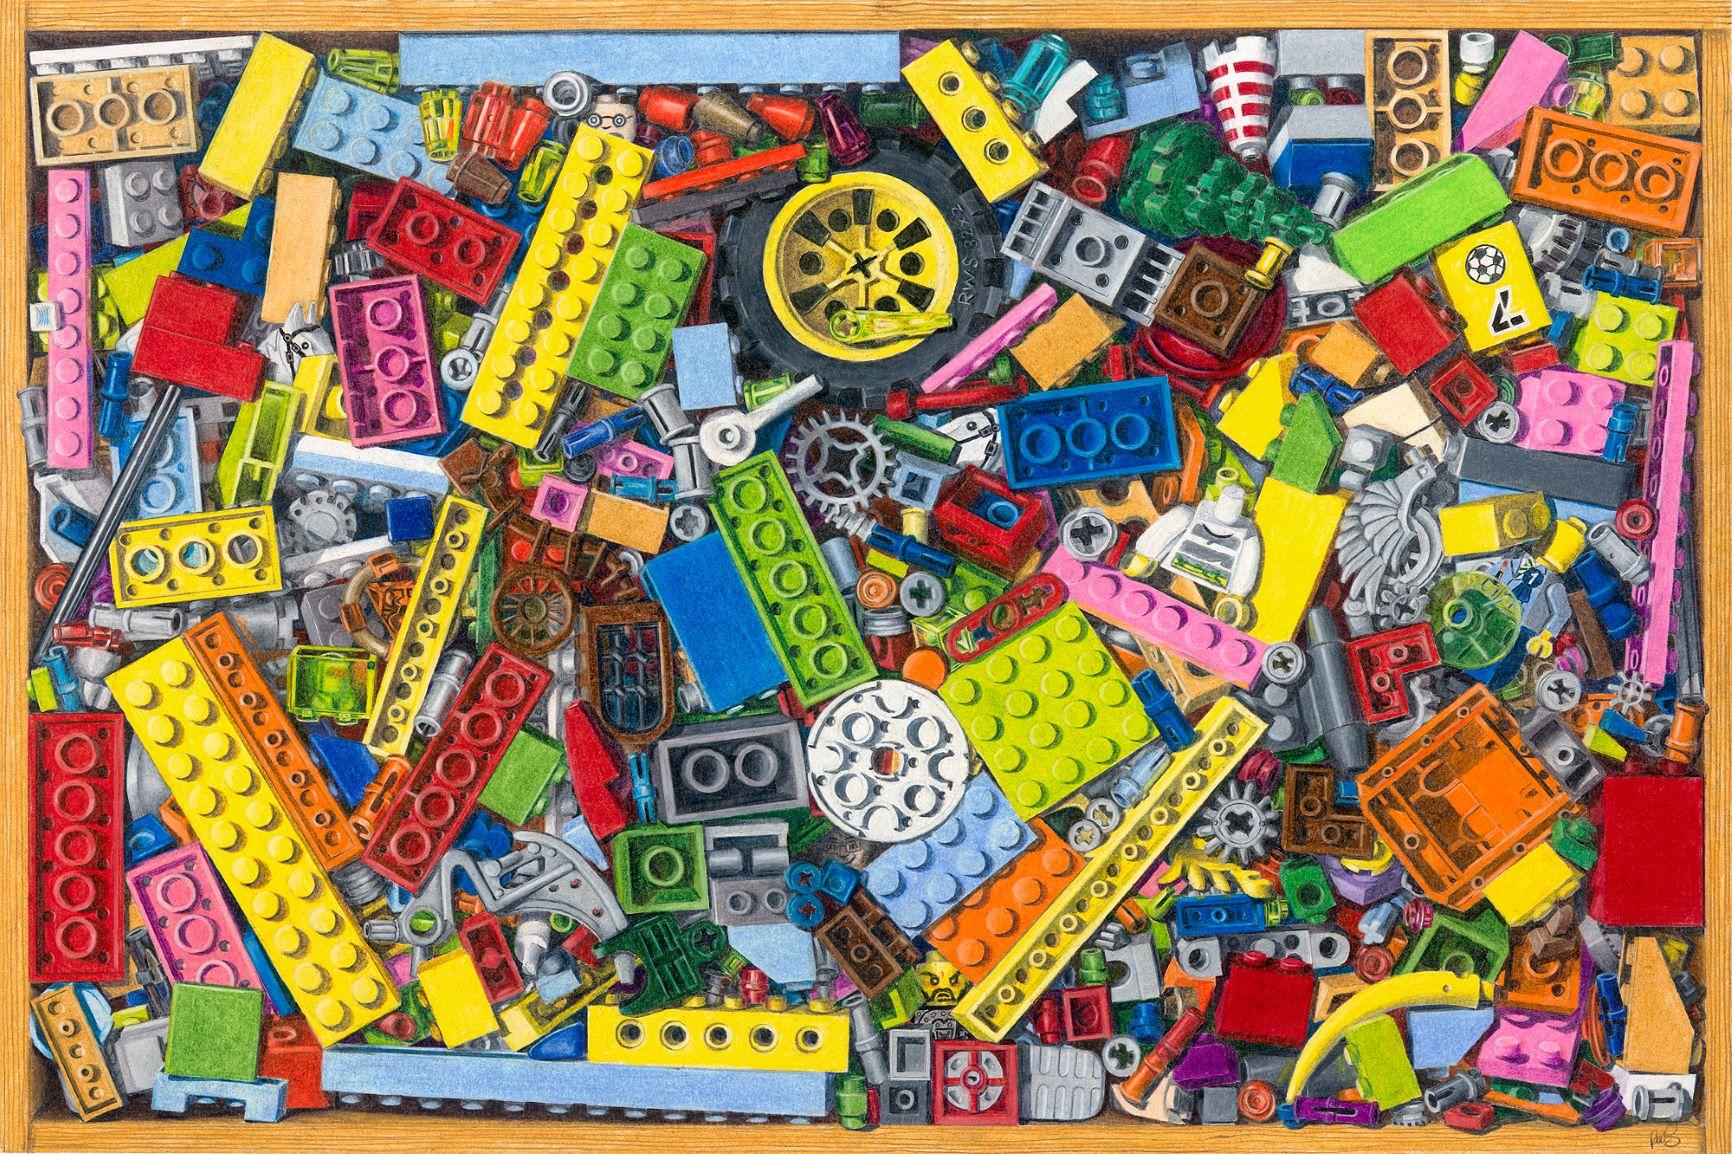 Squashed Plastic Toy Bricks